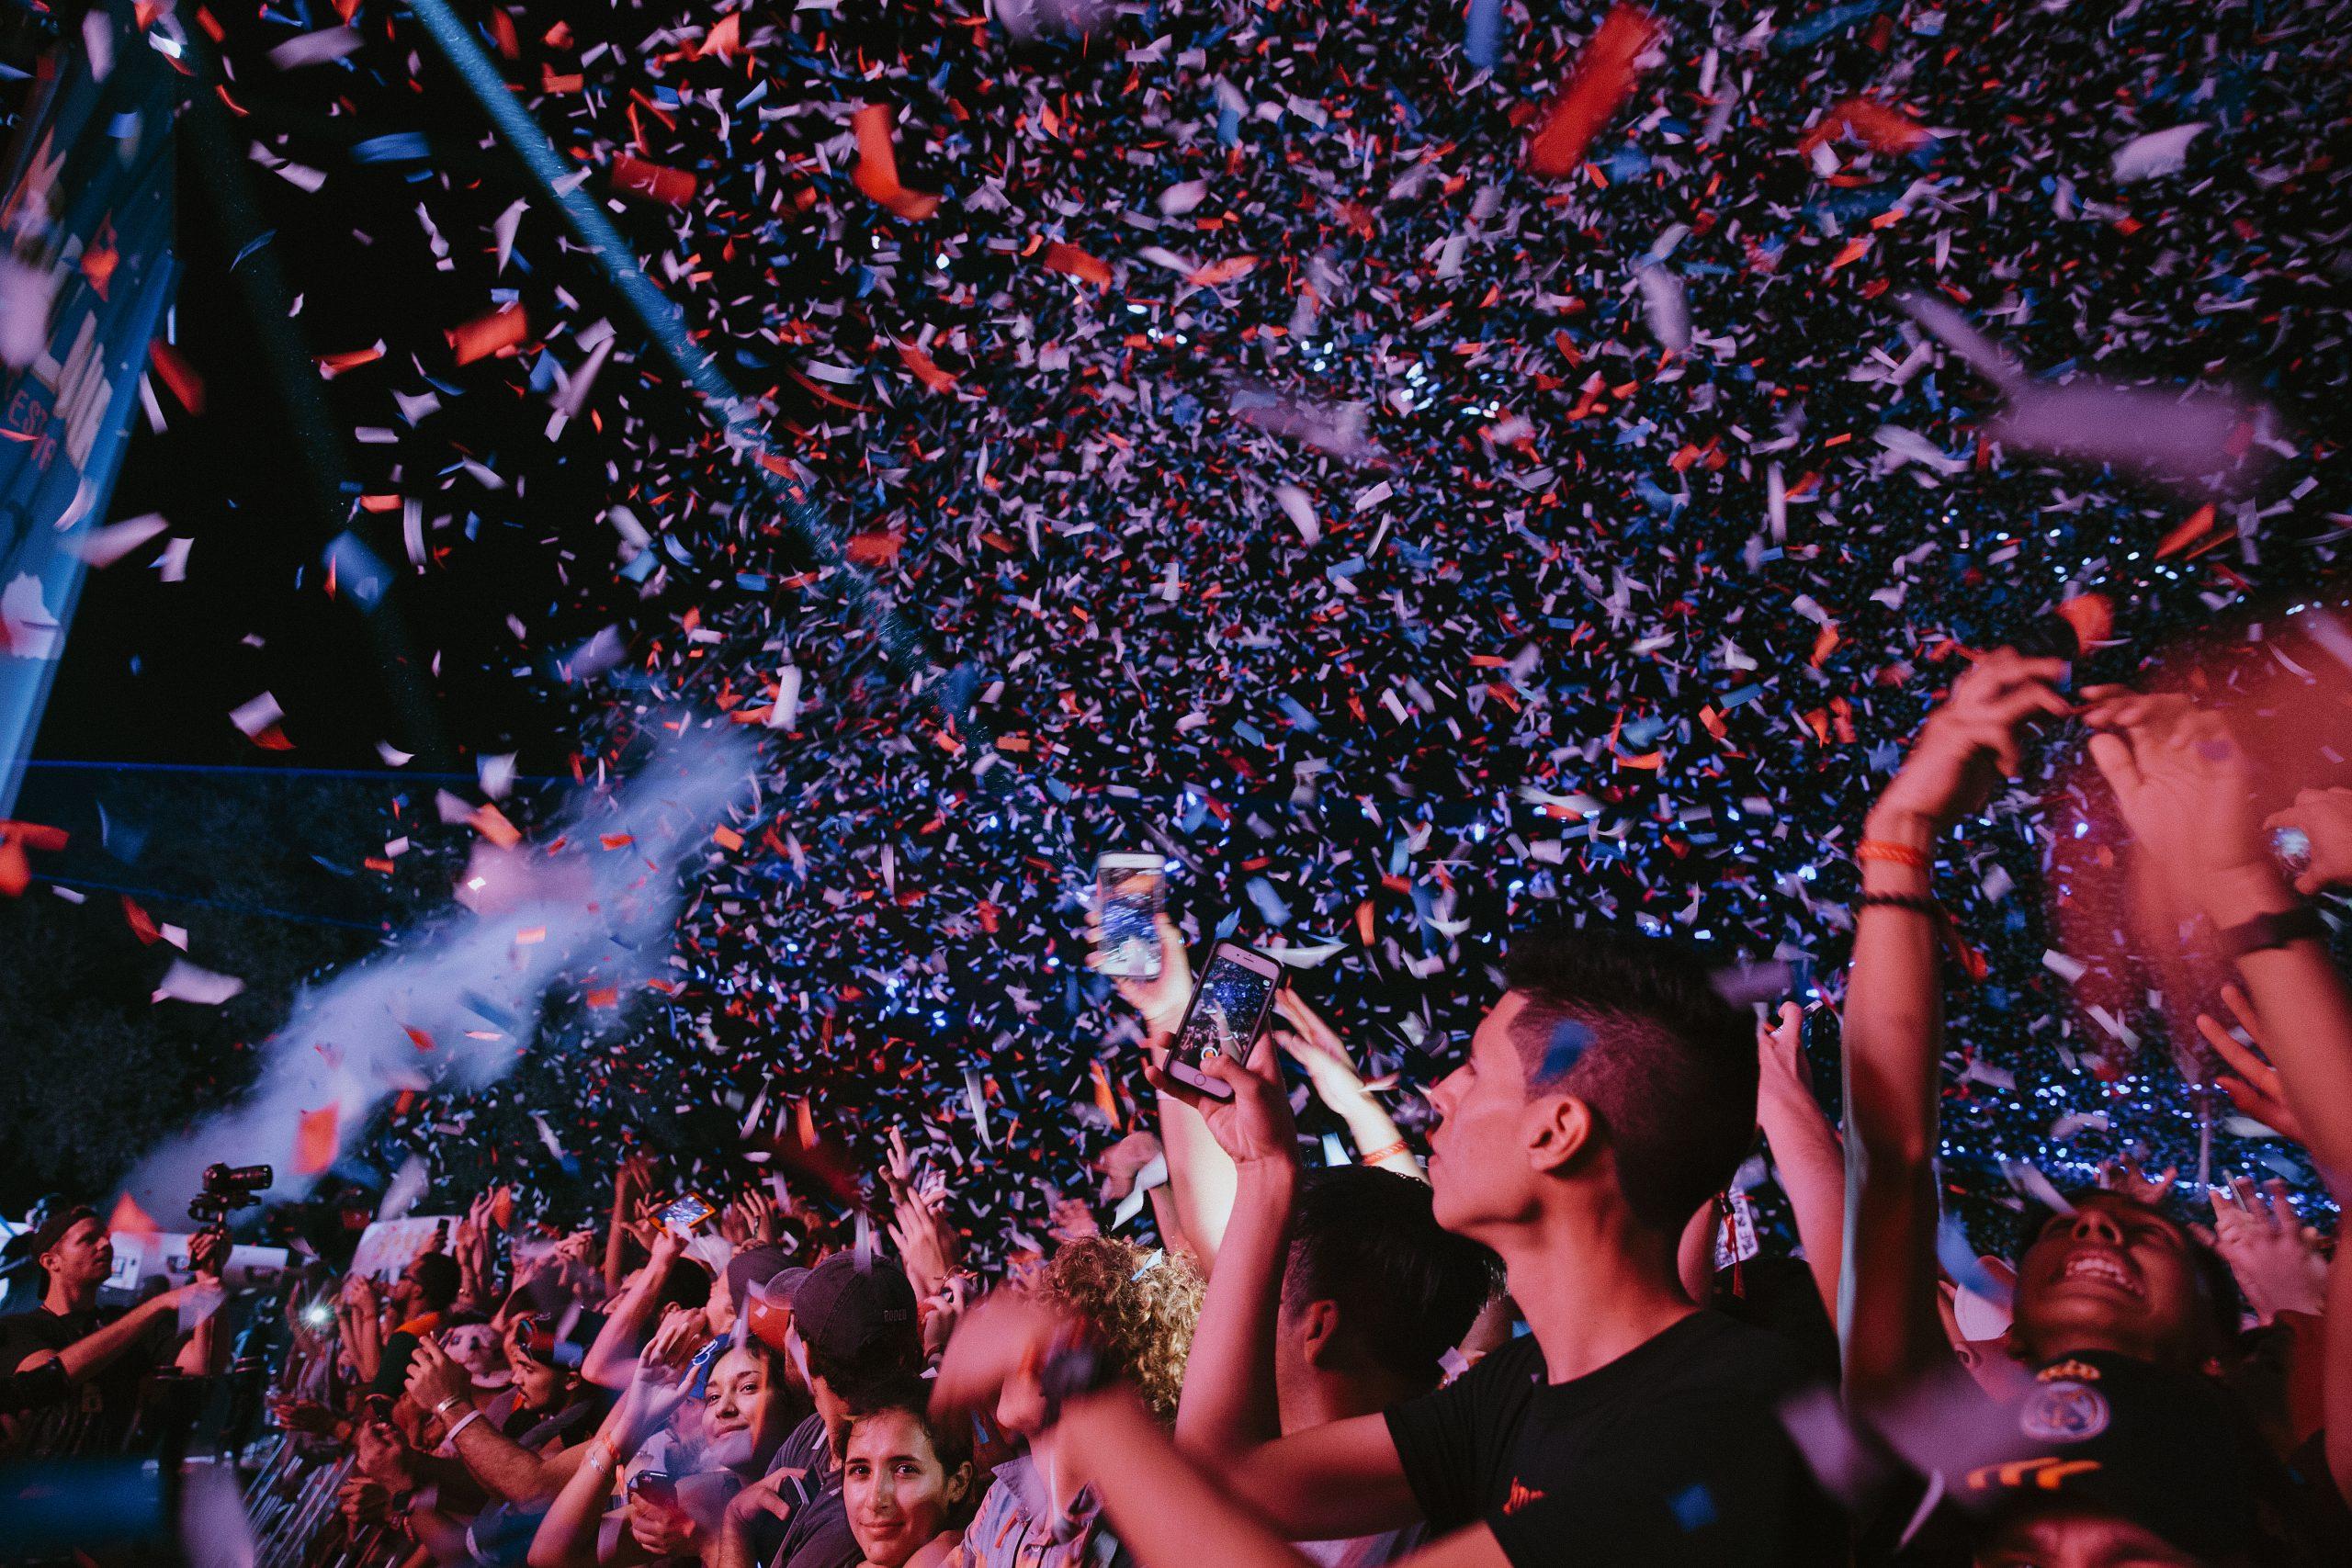 Confetti showers the crowd at last years Mala Luna. Photo courtesy of Greg Noir